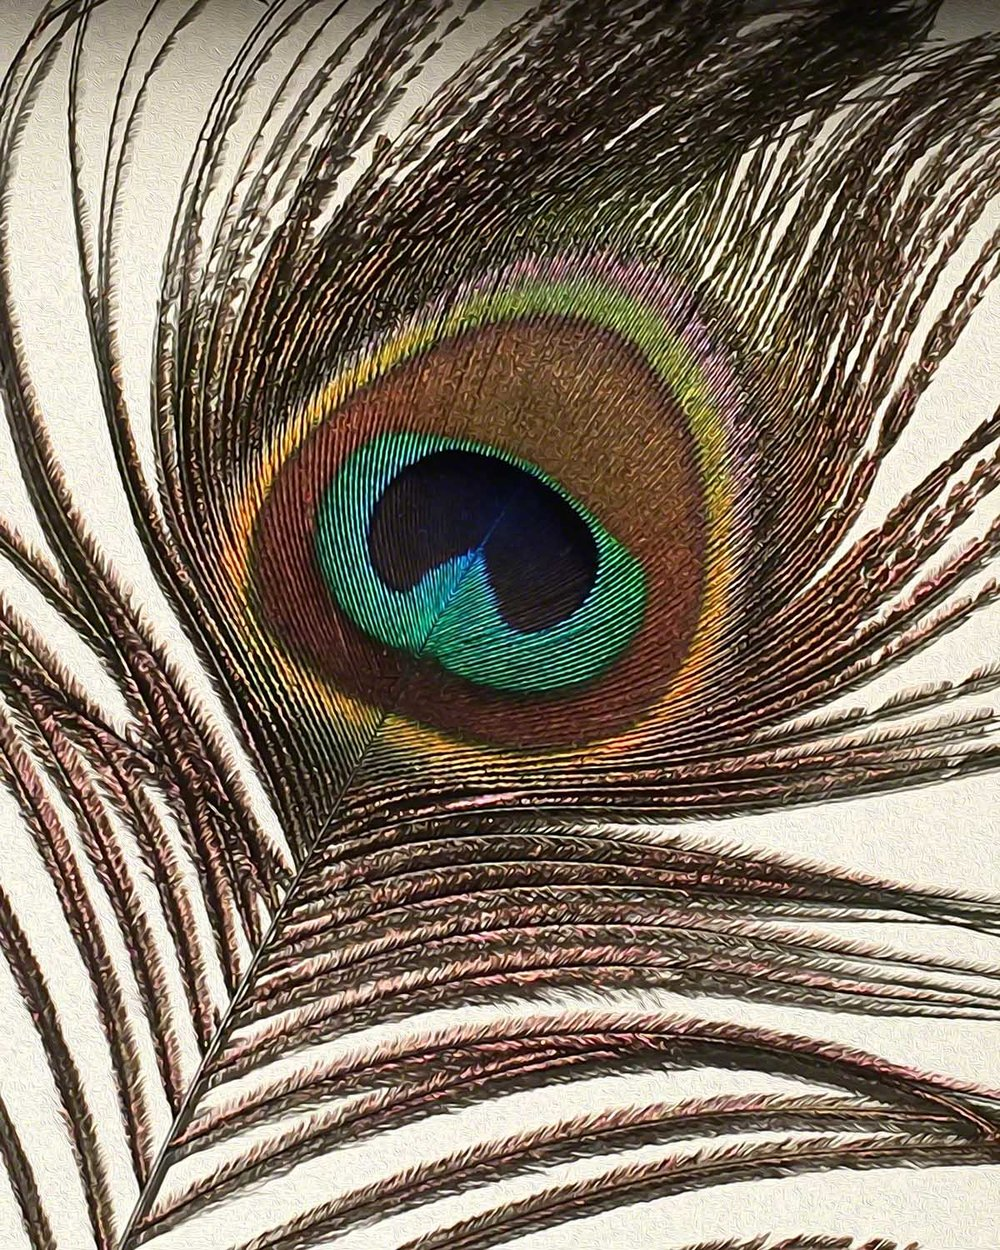 Primal Eye - 16